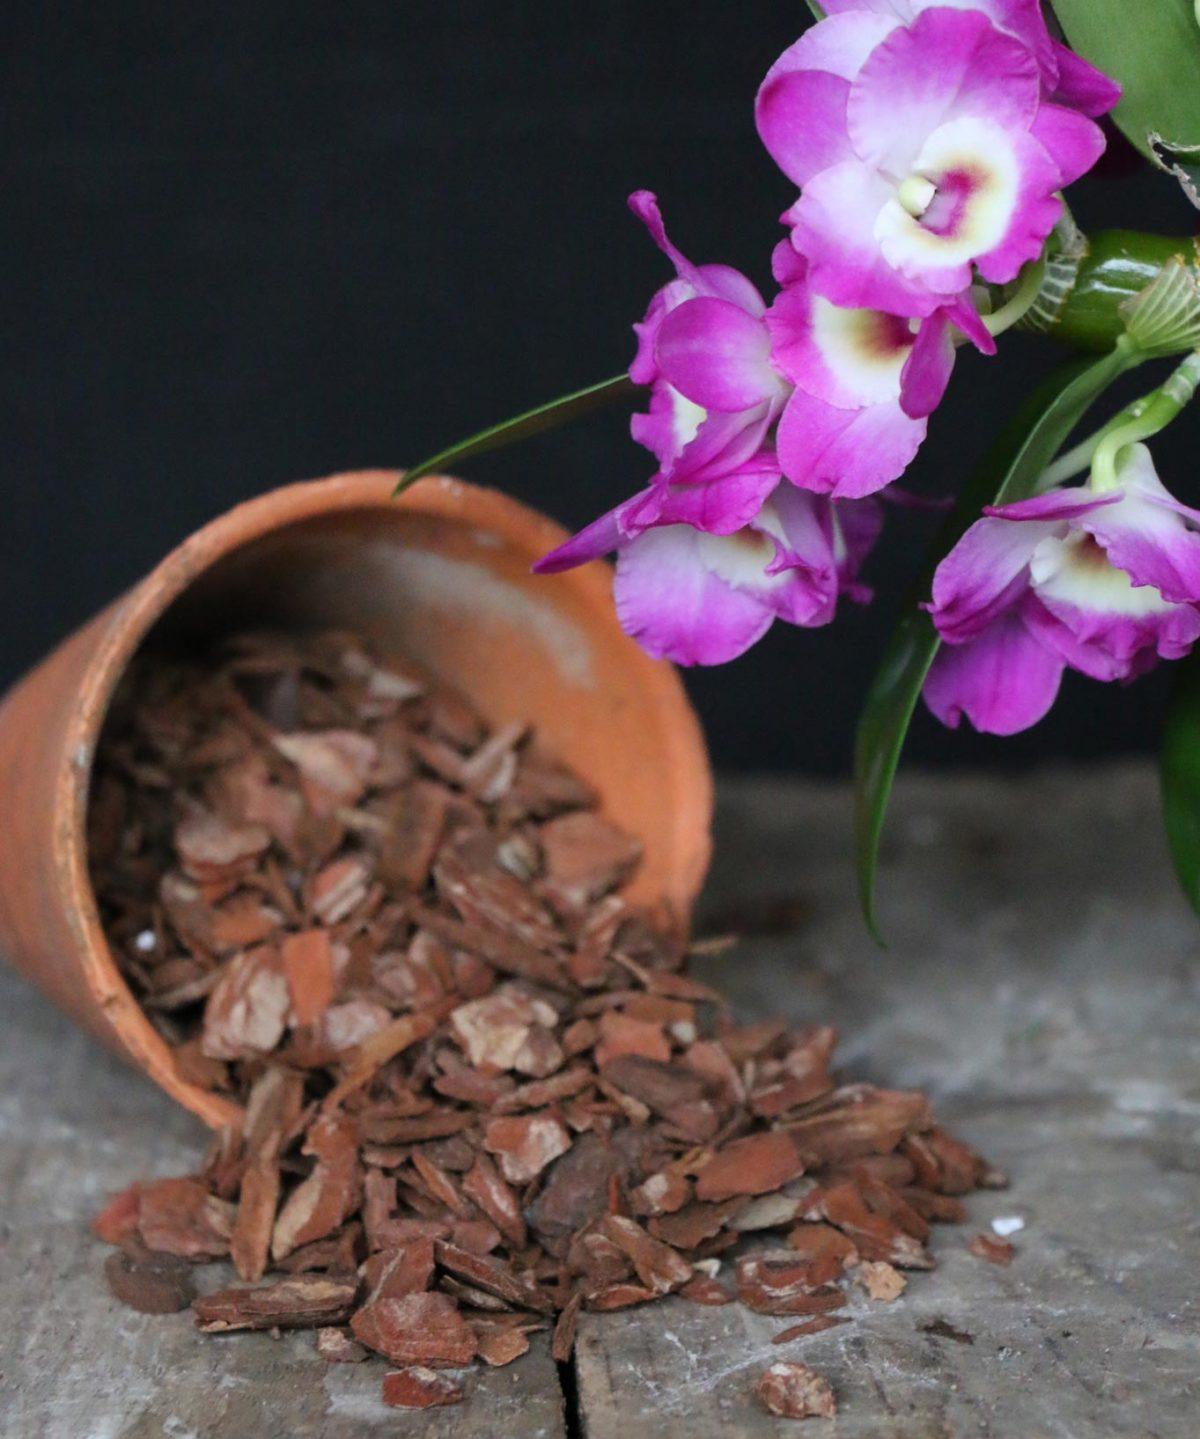 Giá thể trồng hoa lan phổ biến